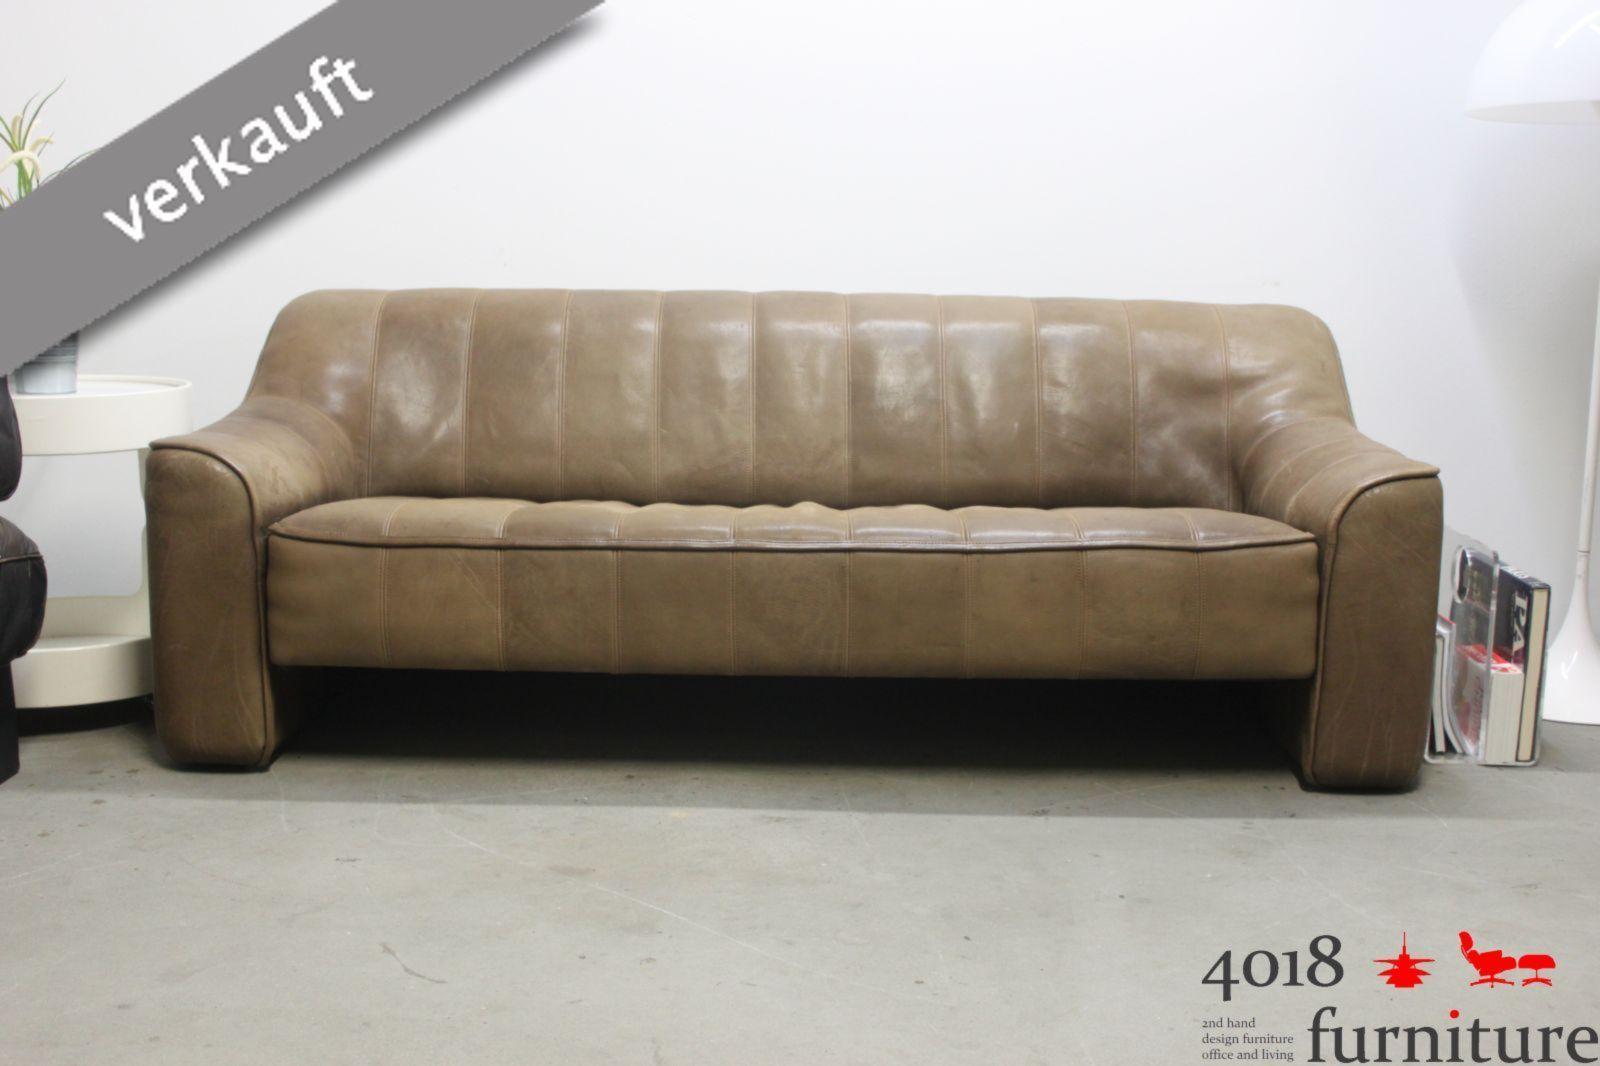 de sede ds 44 neckleder b ffelleder sofa couch canape 3 sitzer braun. Black Bedroom Furniture Sets. Home Design Ideas